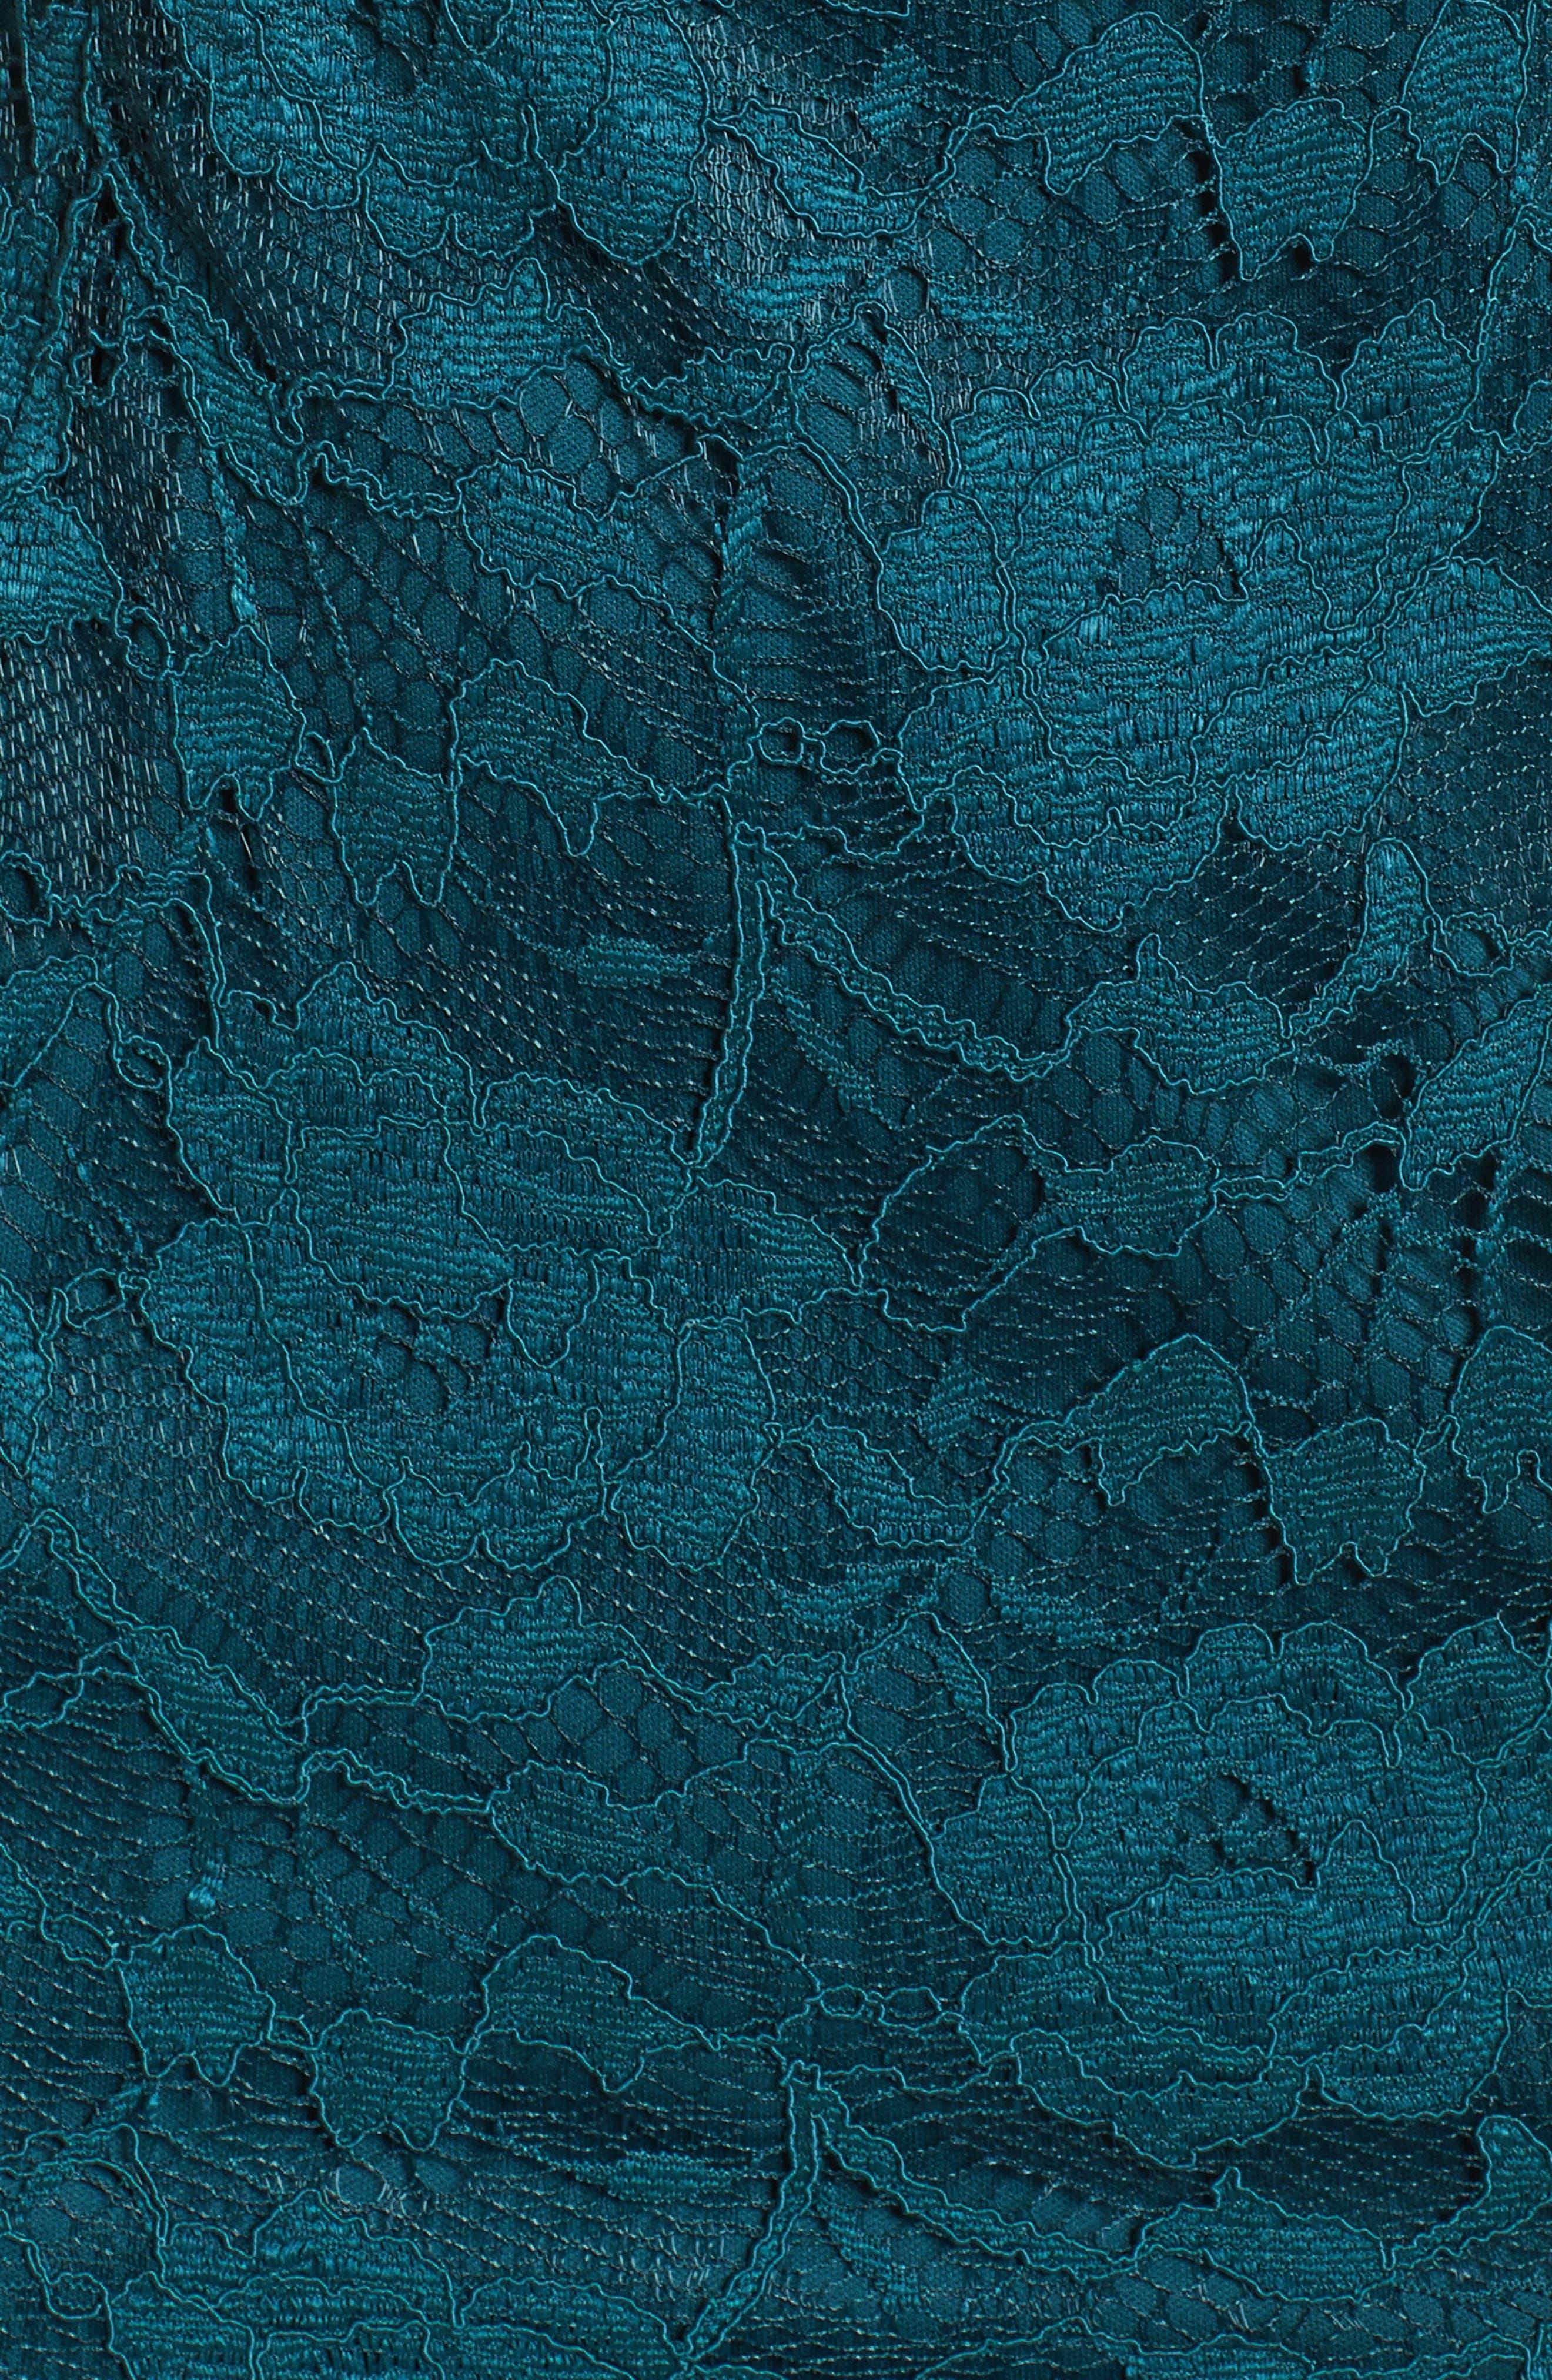 Lace Sheath Dress,                             Alternate thumbnail 5, color,                             300